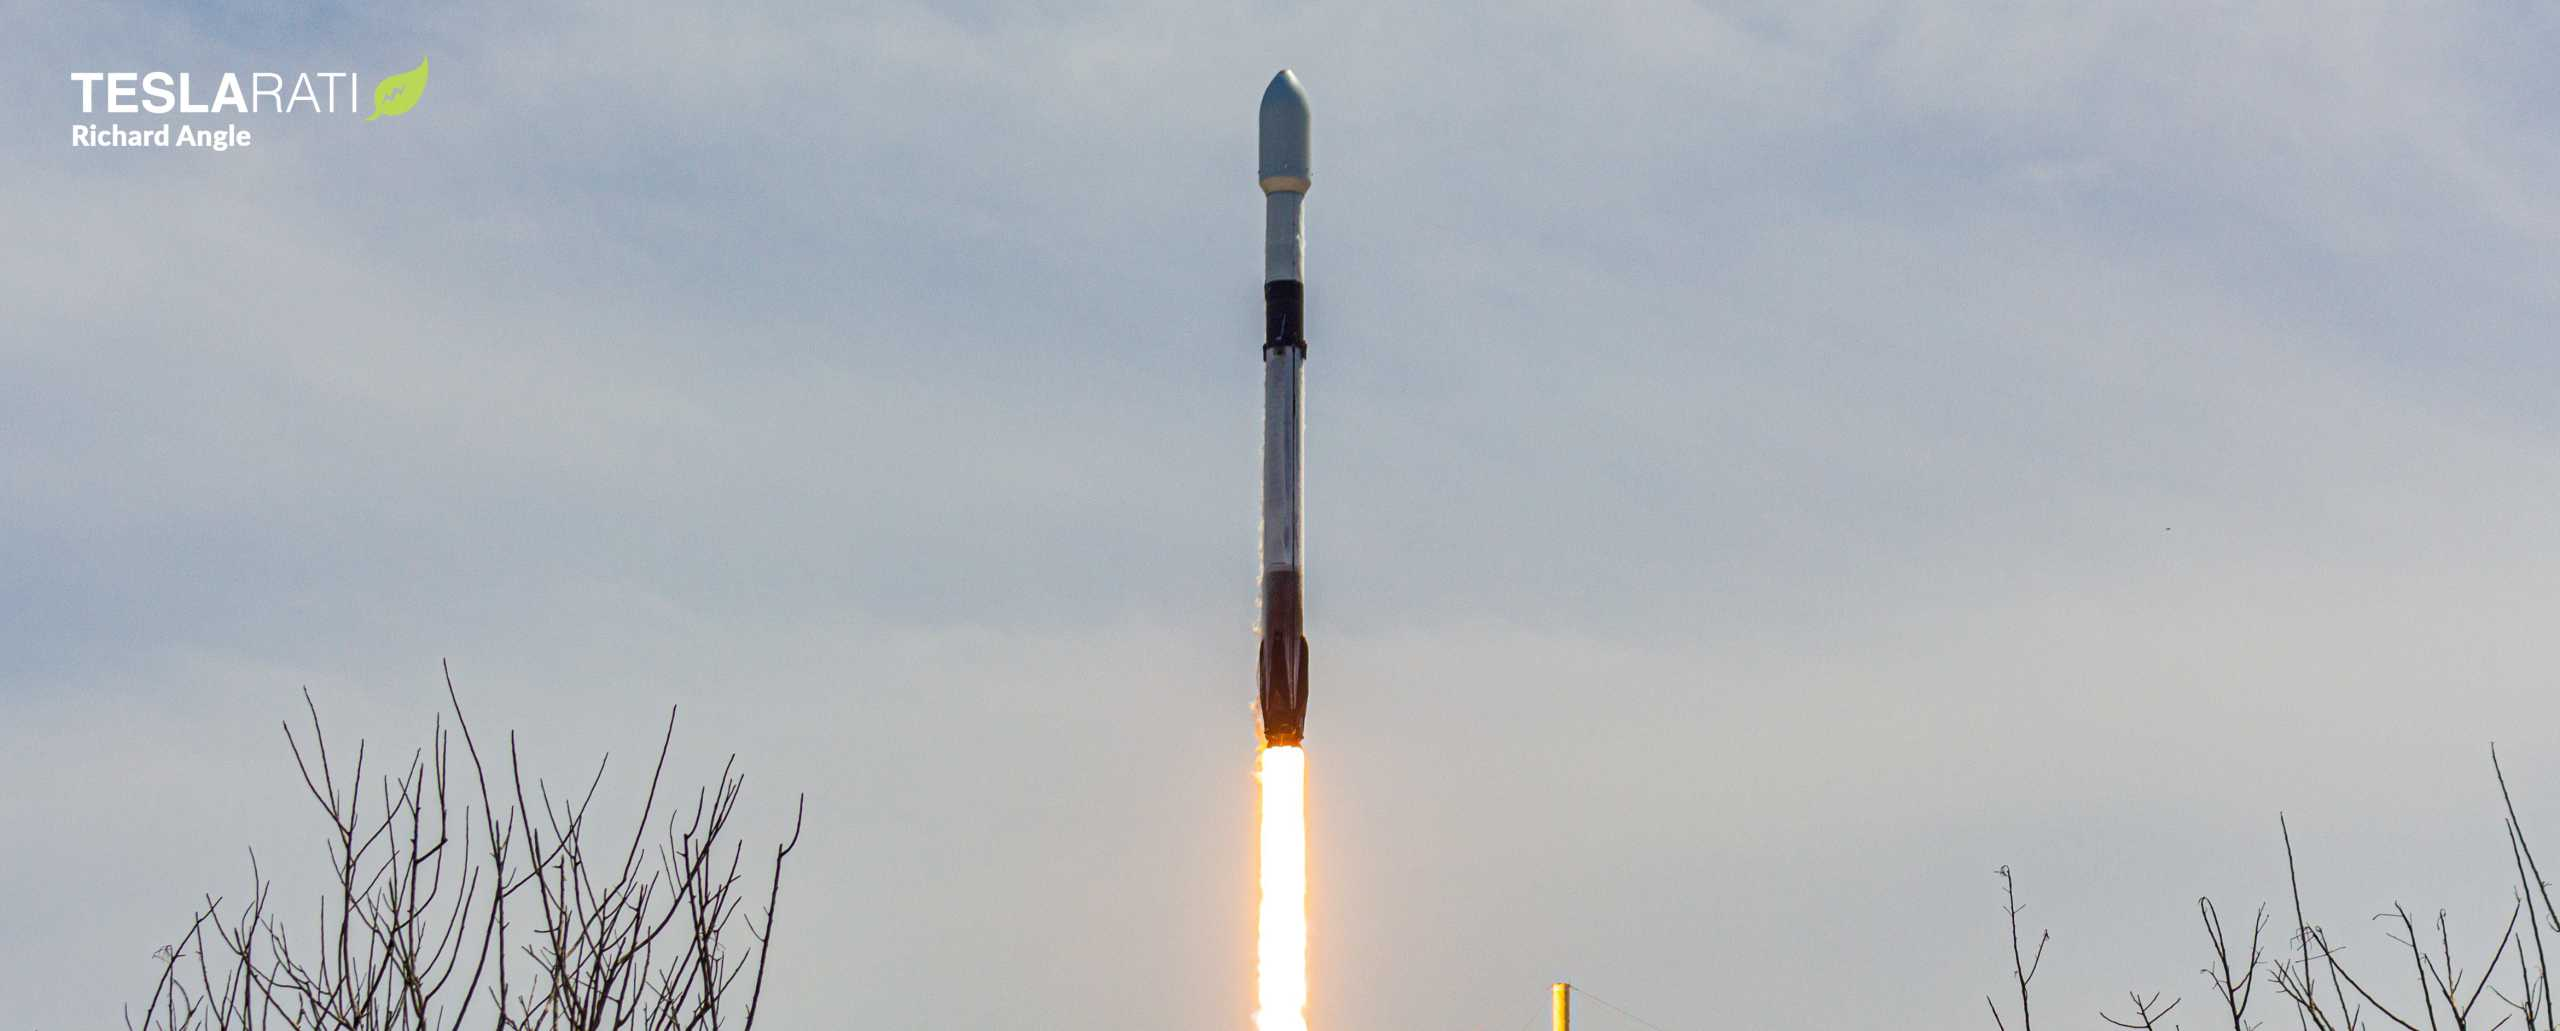 Falcon 9 Starlink 6 042220 (Richard Angle) launch 4 (c)